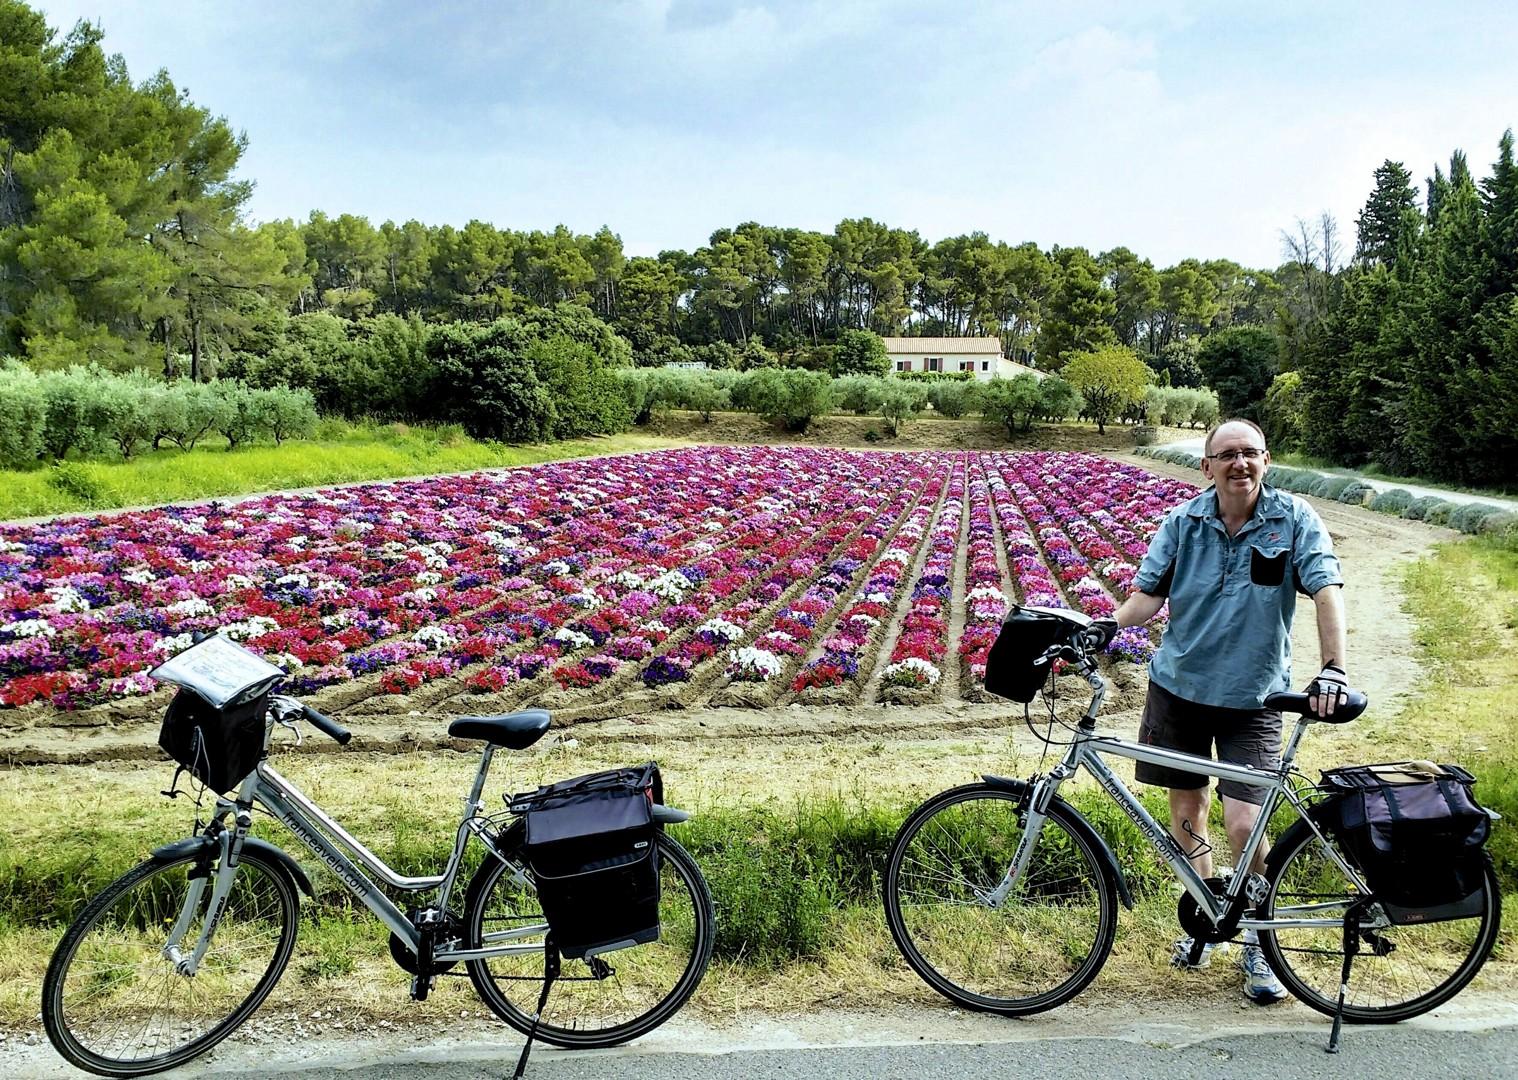 lesiure-cycling-holiday-france-provence.jpg - France - Provence - Self-Guided Leisure Cycling Holiday - Leisure Cycling